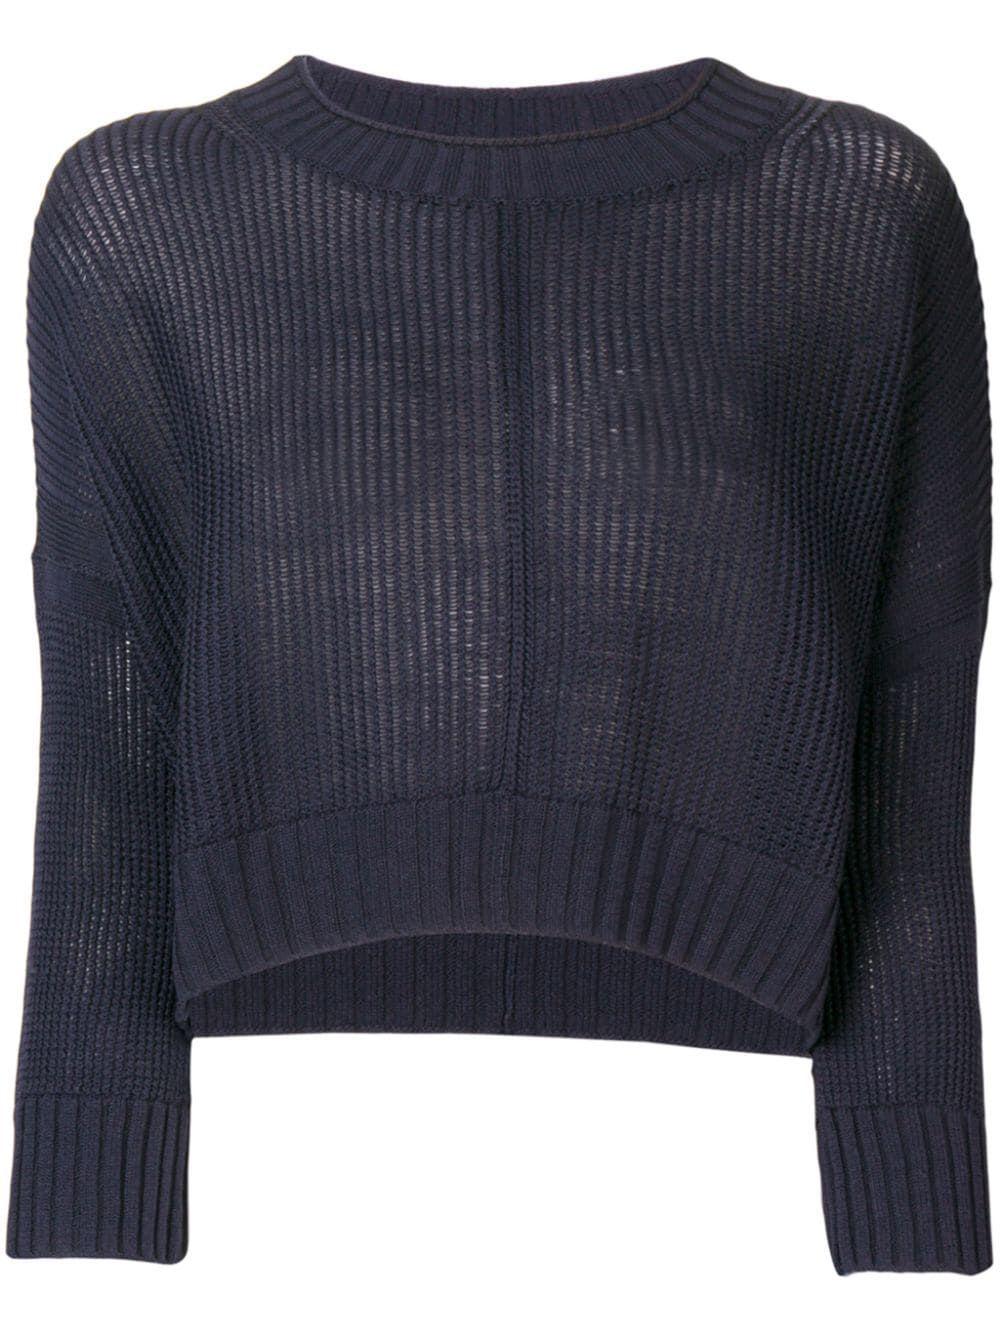 Chunky knit jumper #chunkyknitjumper